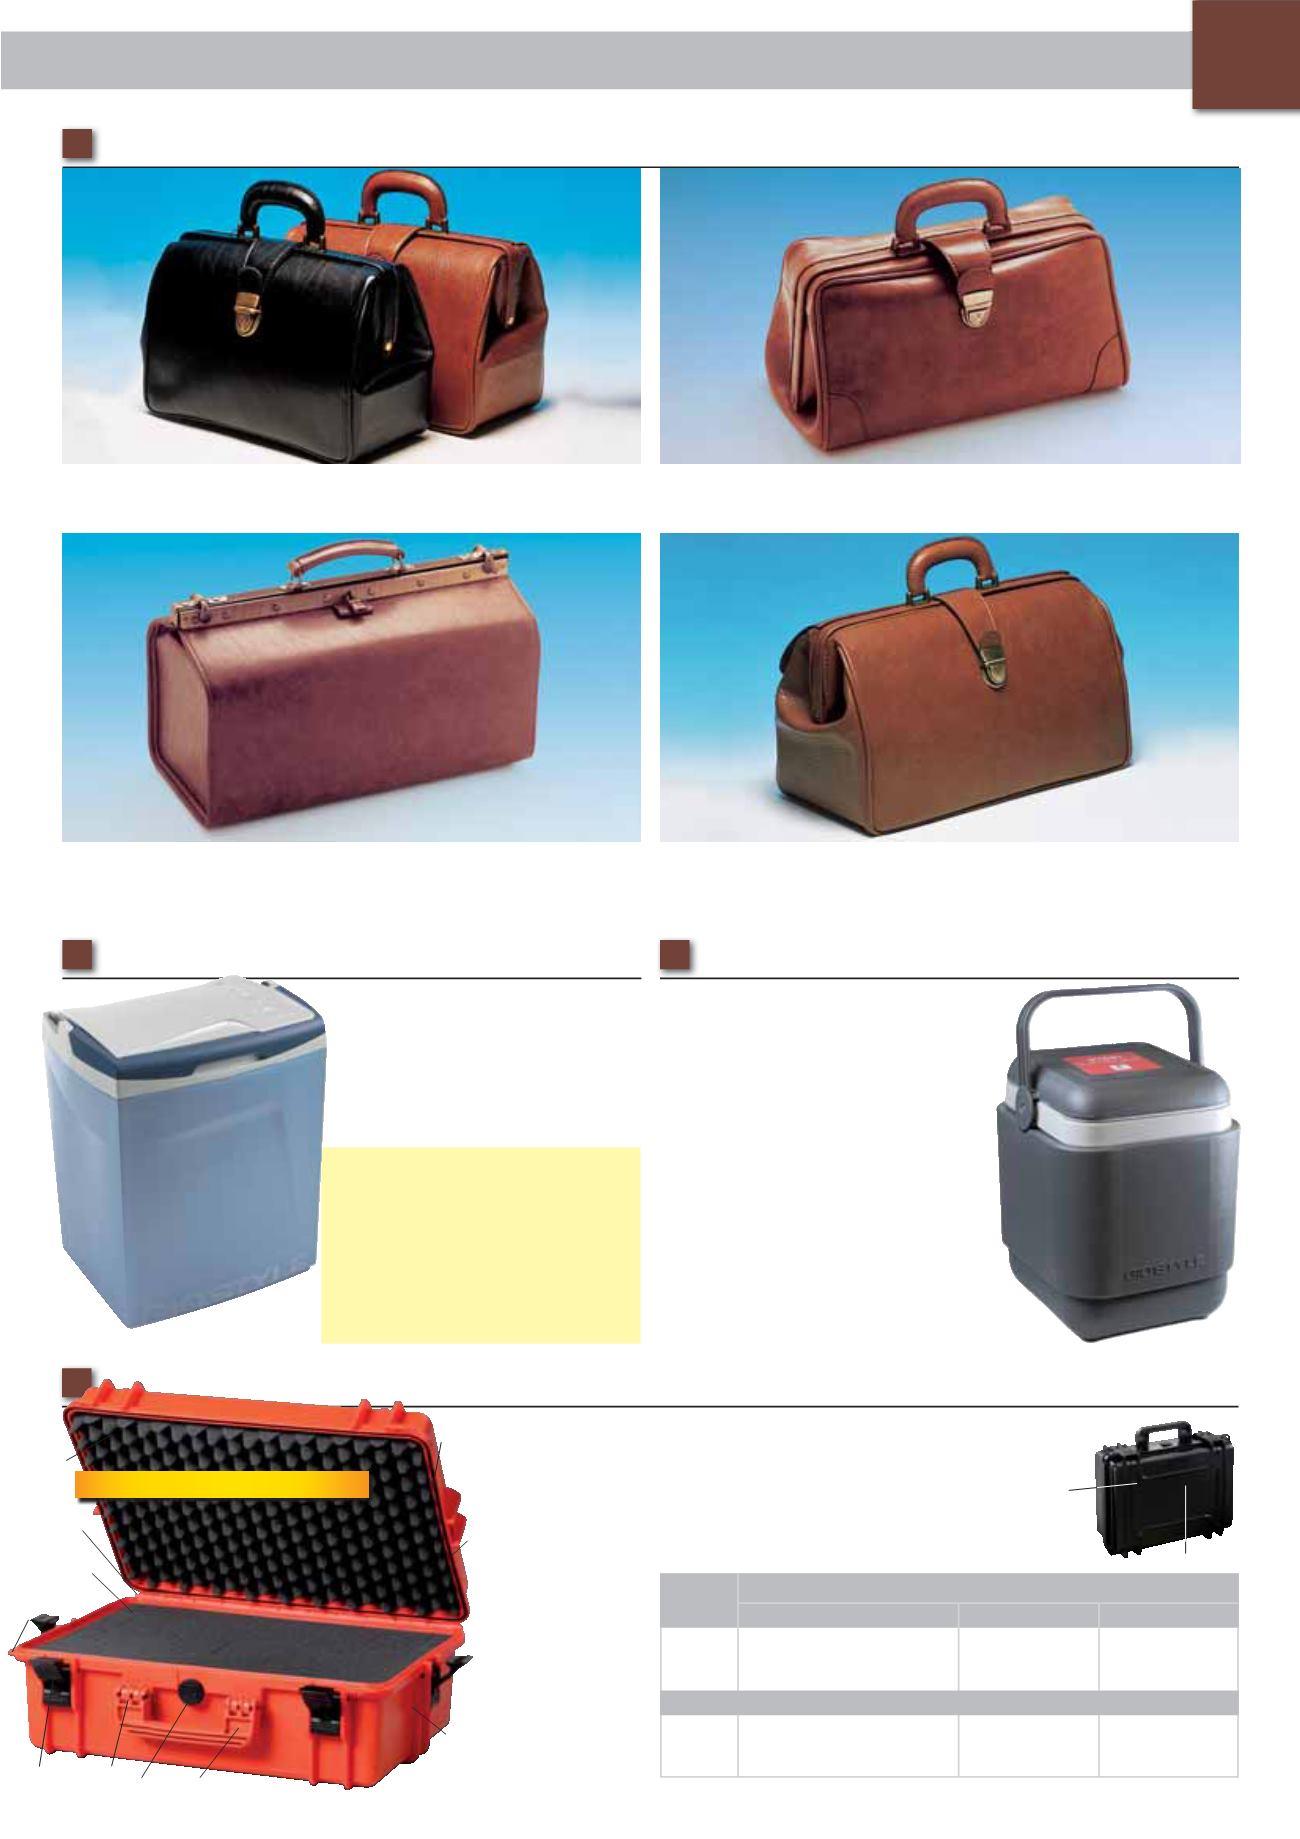 Gima International Catalogue 2014-2015 - page 57. MEDICAL BAGS. 48. • 27105  SUPERTEXAS skay - colour  cognac 3c81a8060d3